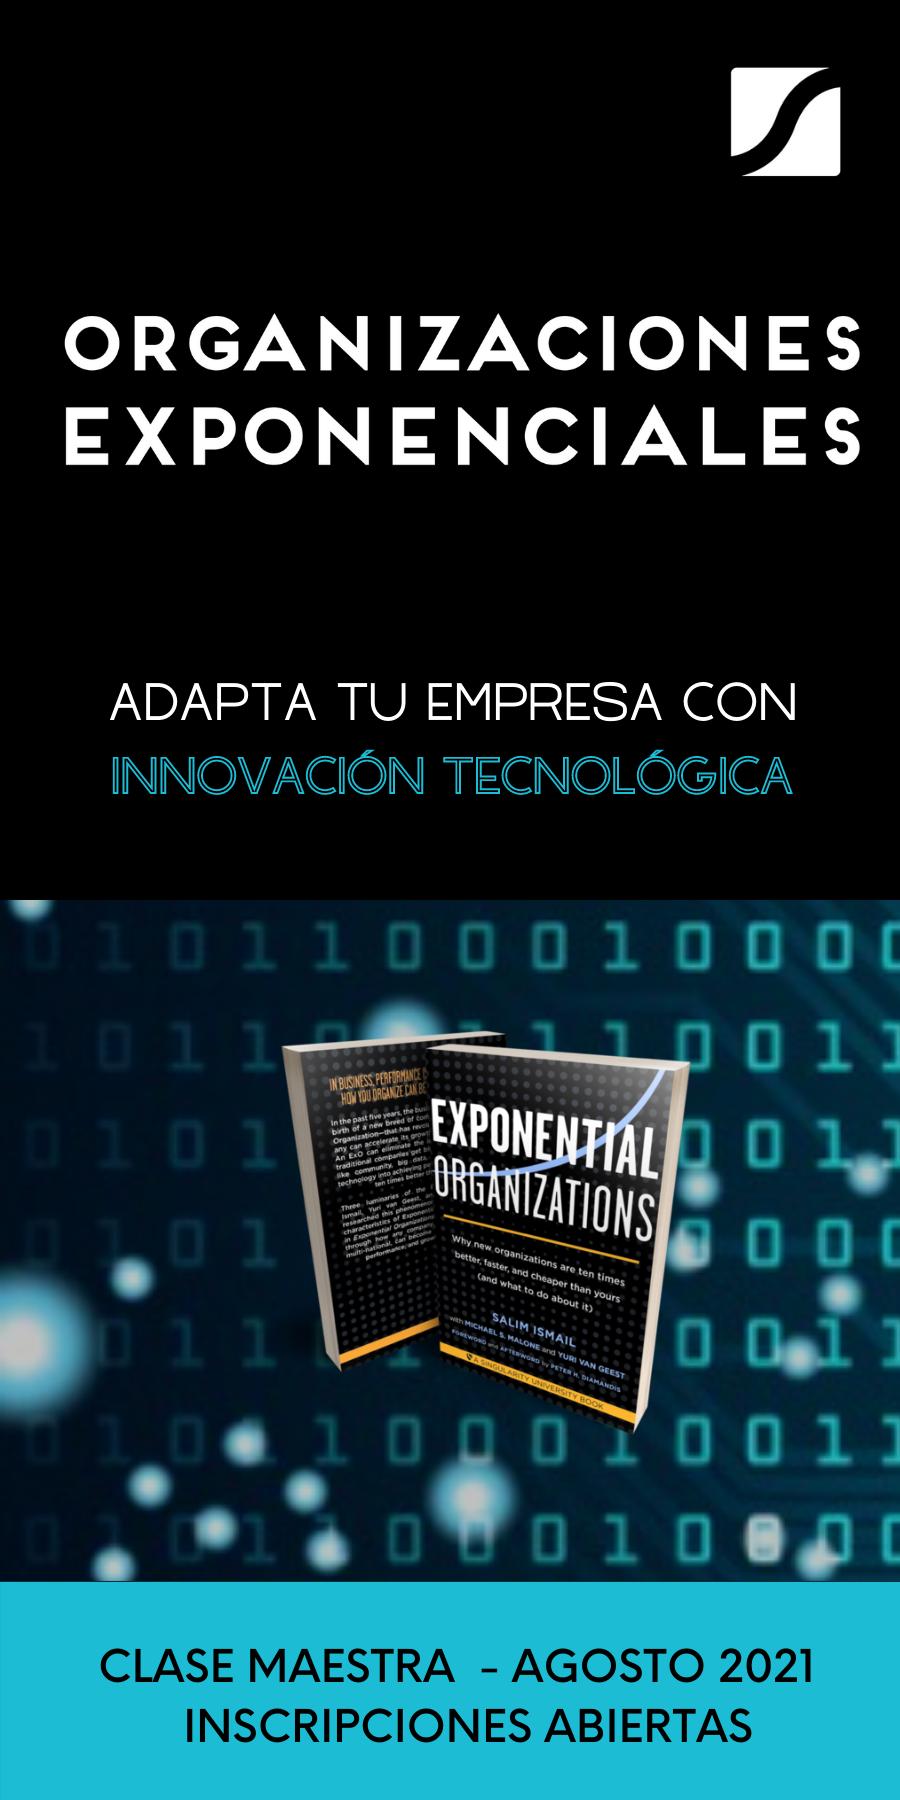 Copia de ADAPTA TU EMPRESA CON INNOVACIÓN TECNOLÓGICA